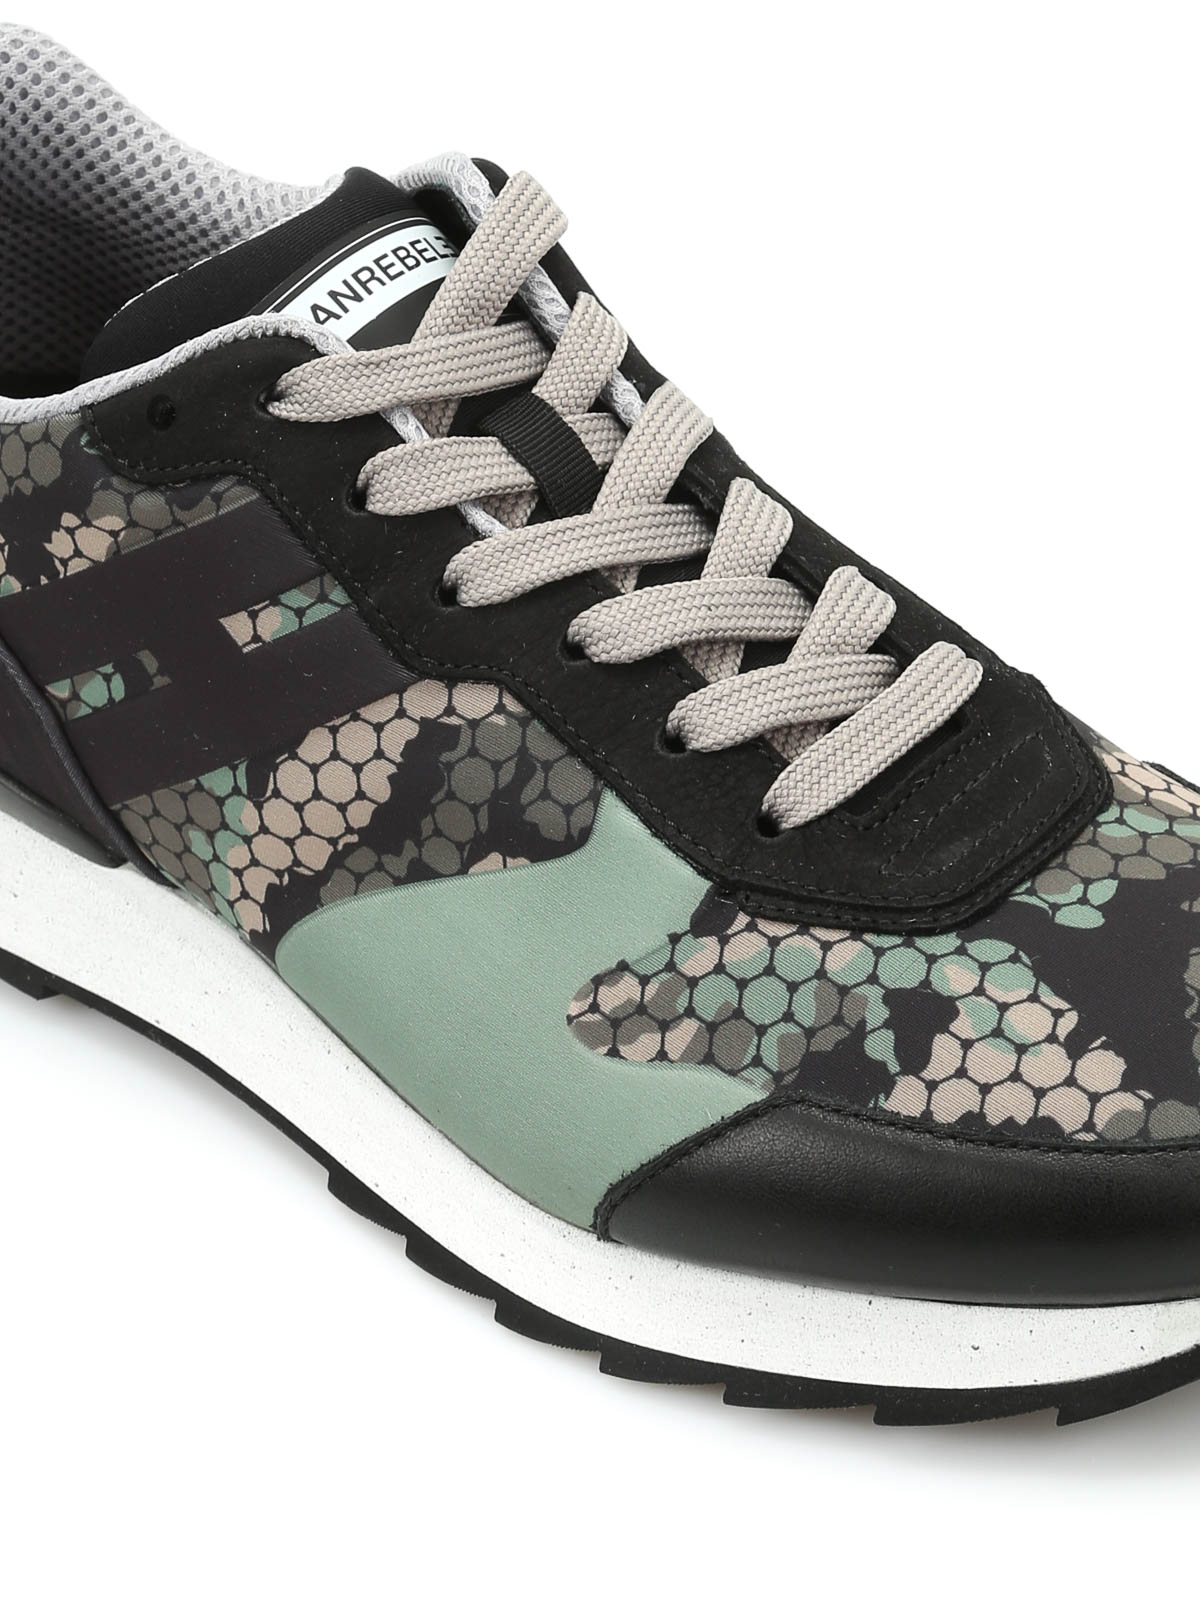 Hogan Rebel - Sneaker Running R261 - sneakers - HXM2610U400CB80XCR 55a04221750